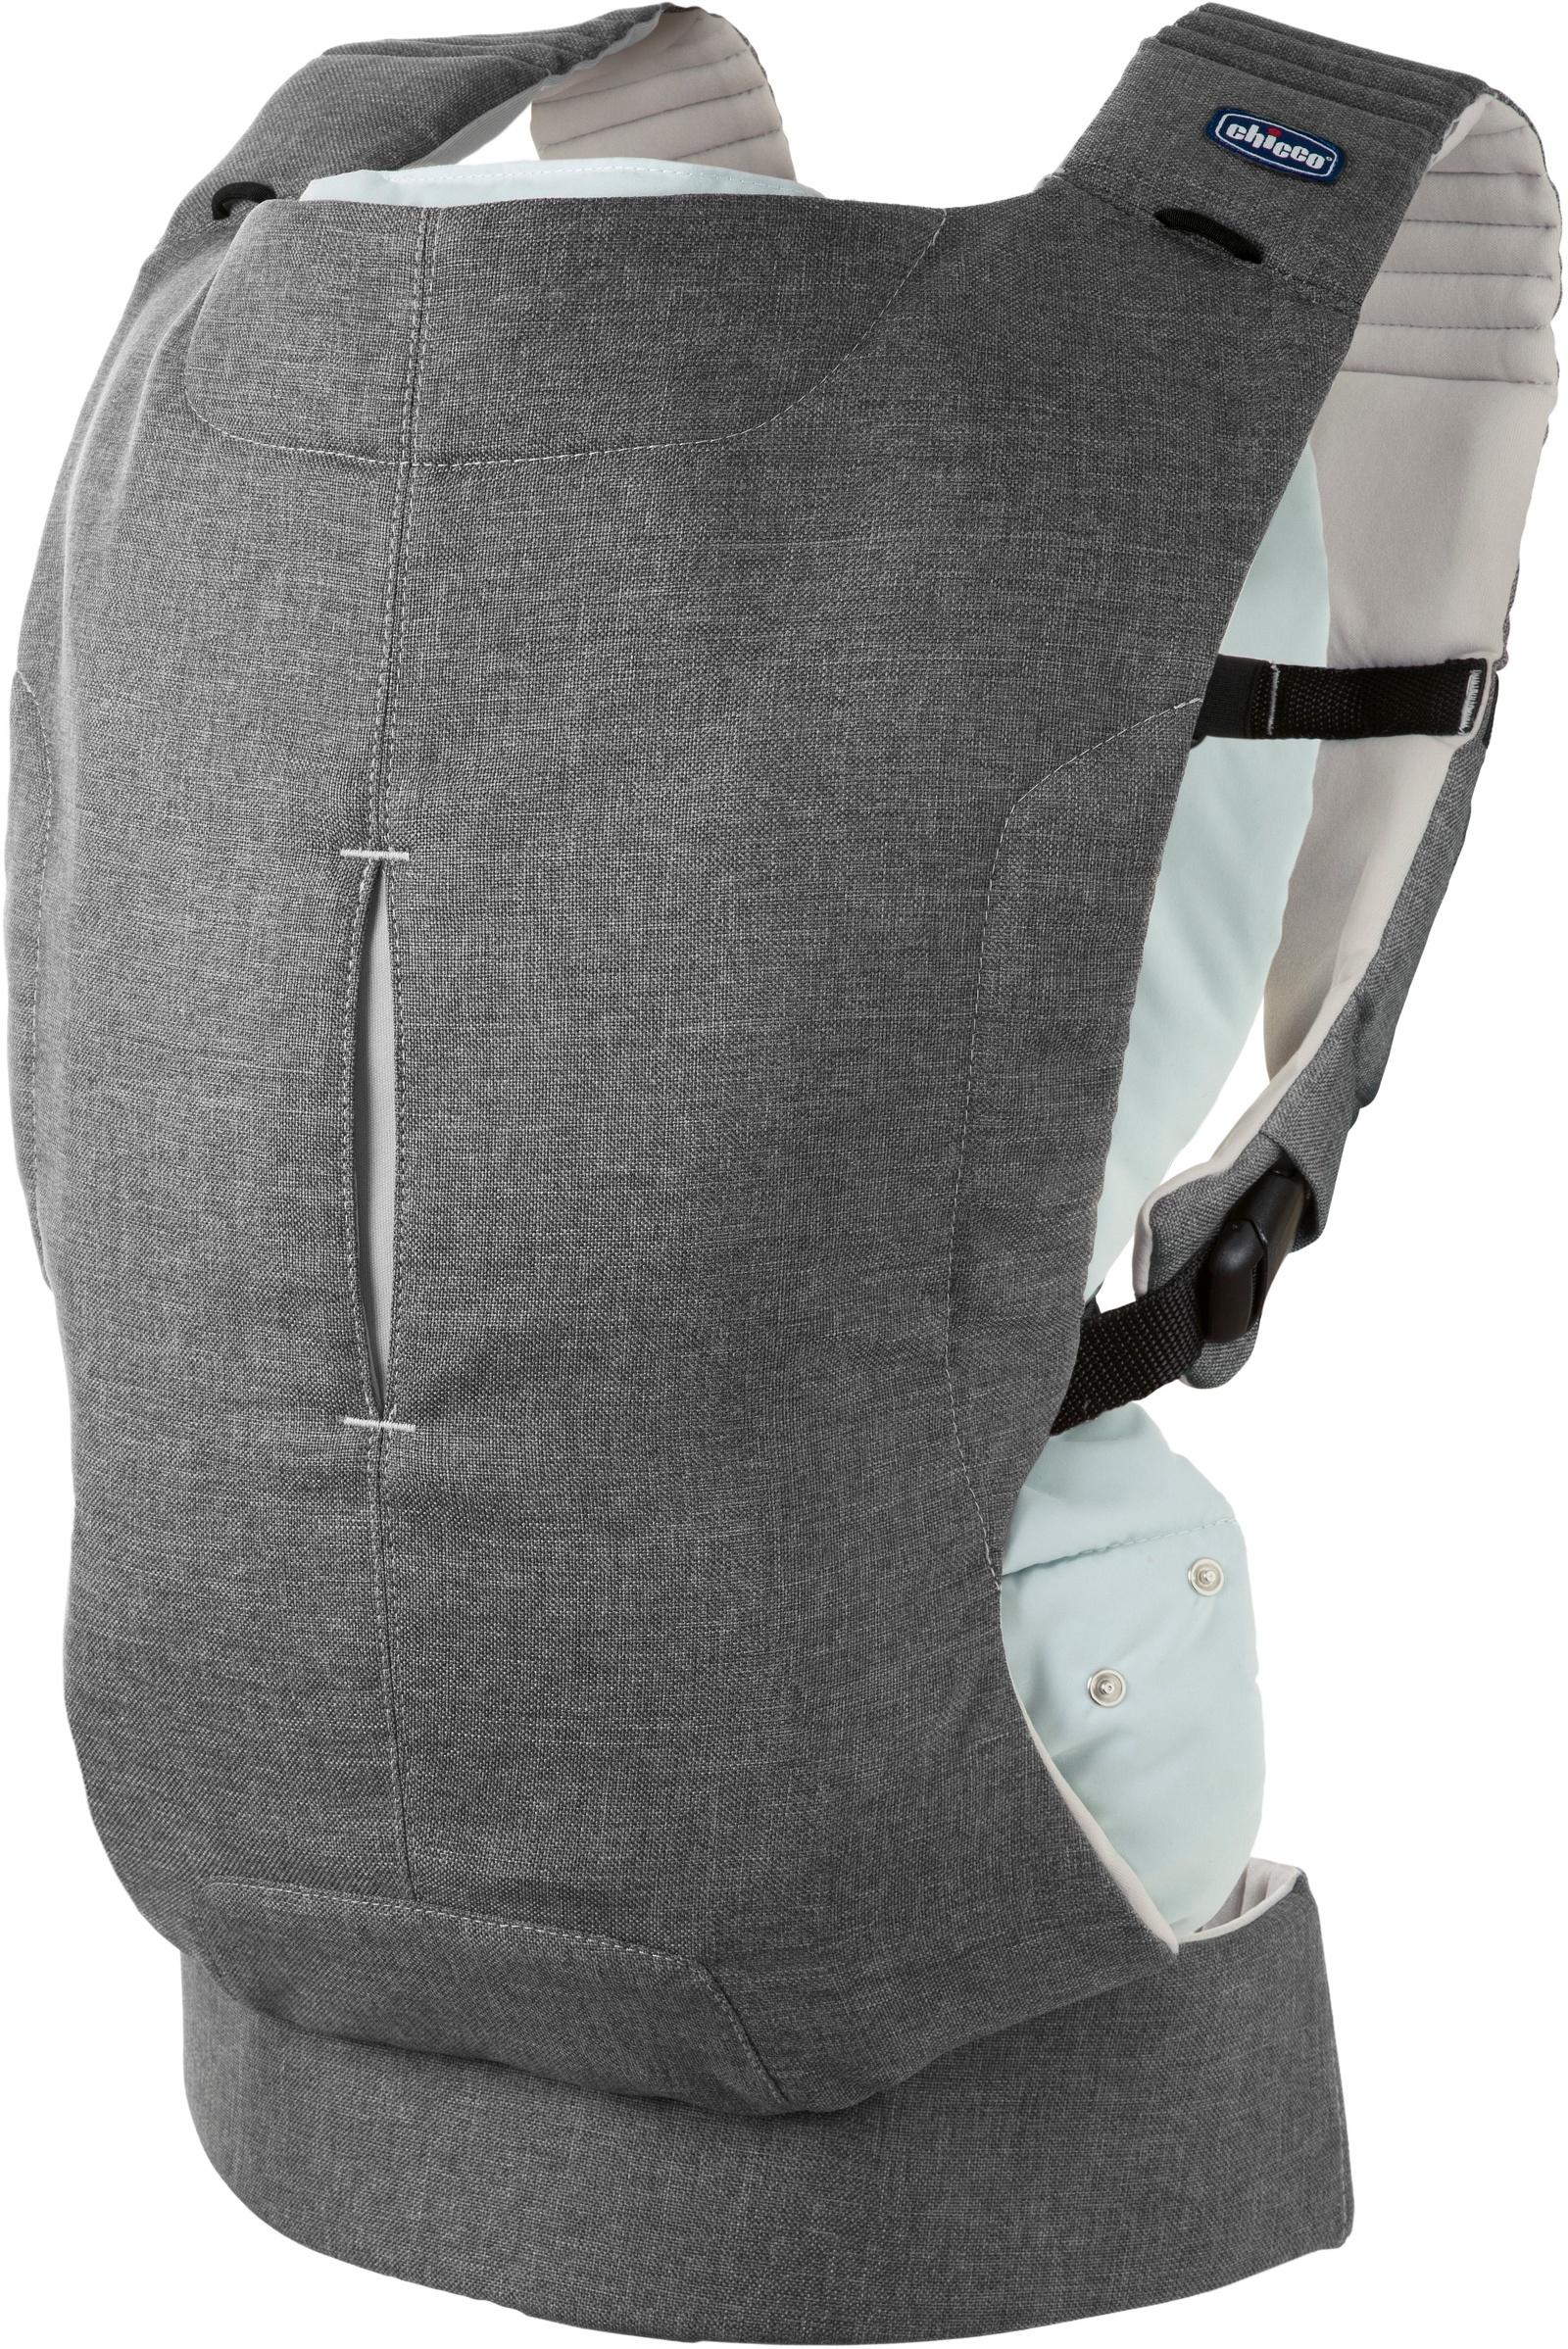 Кенгуру Chicco Myamaki Complete серый chicco рюкзак переноска myamaki complete denim cyclamen